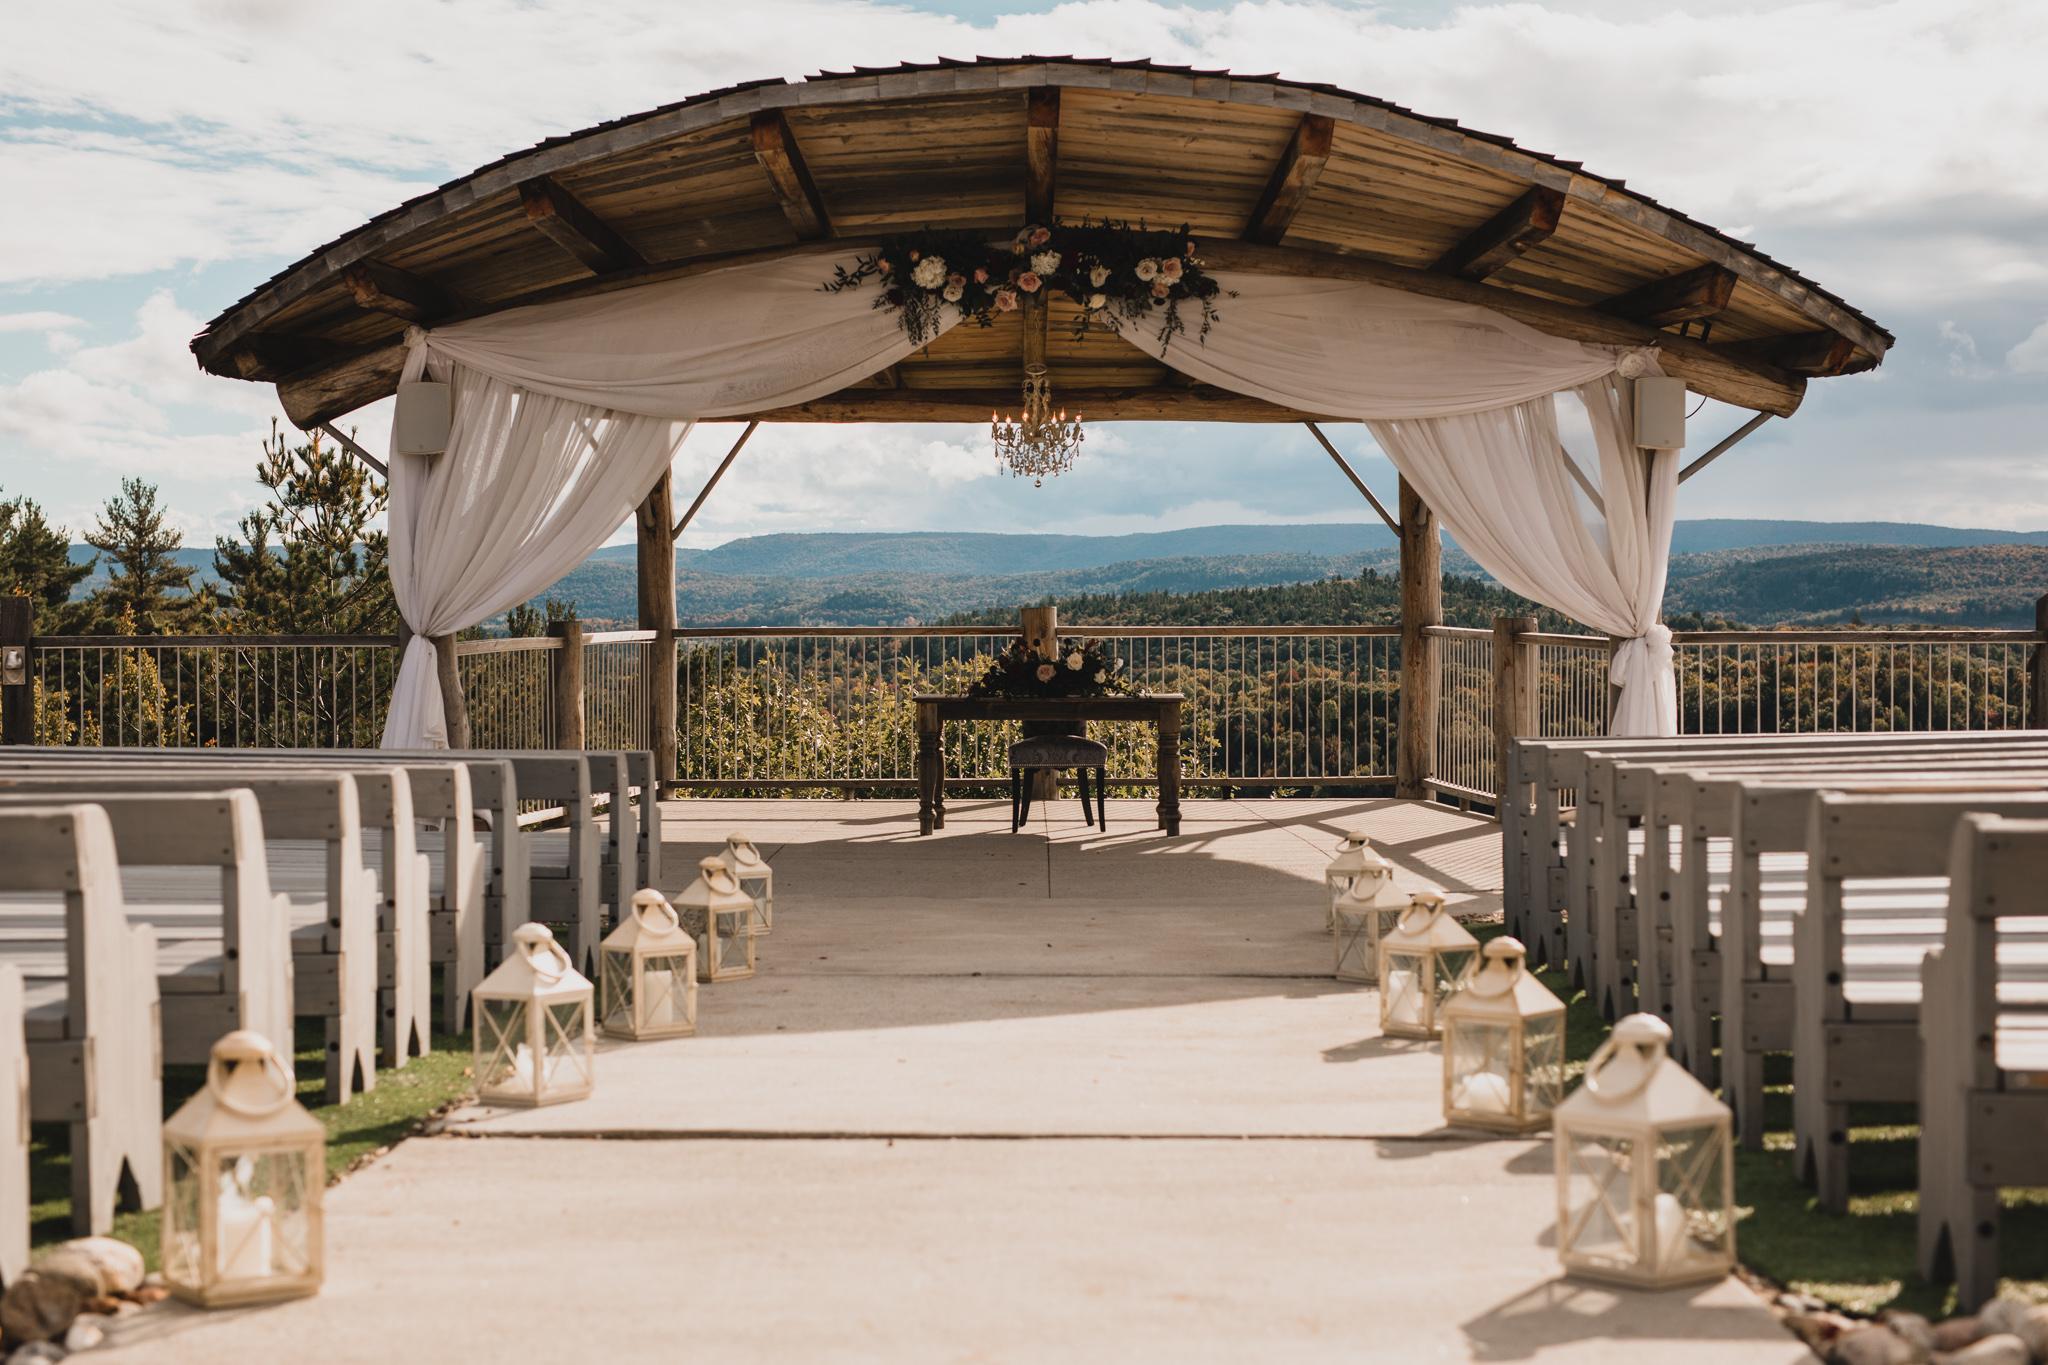 Outdoor wedding ceremony venue - Ottawa and Gatineau